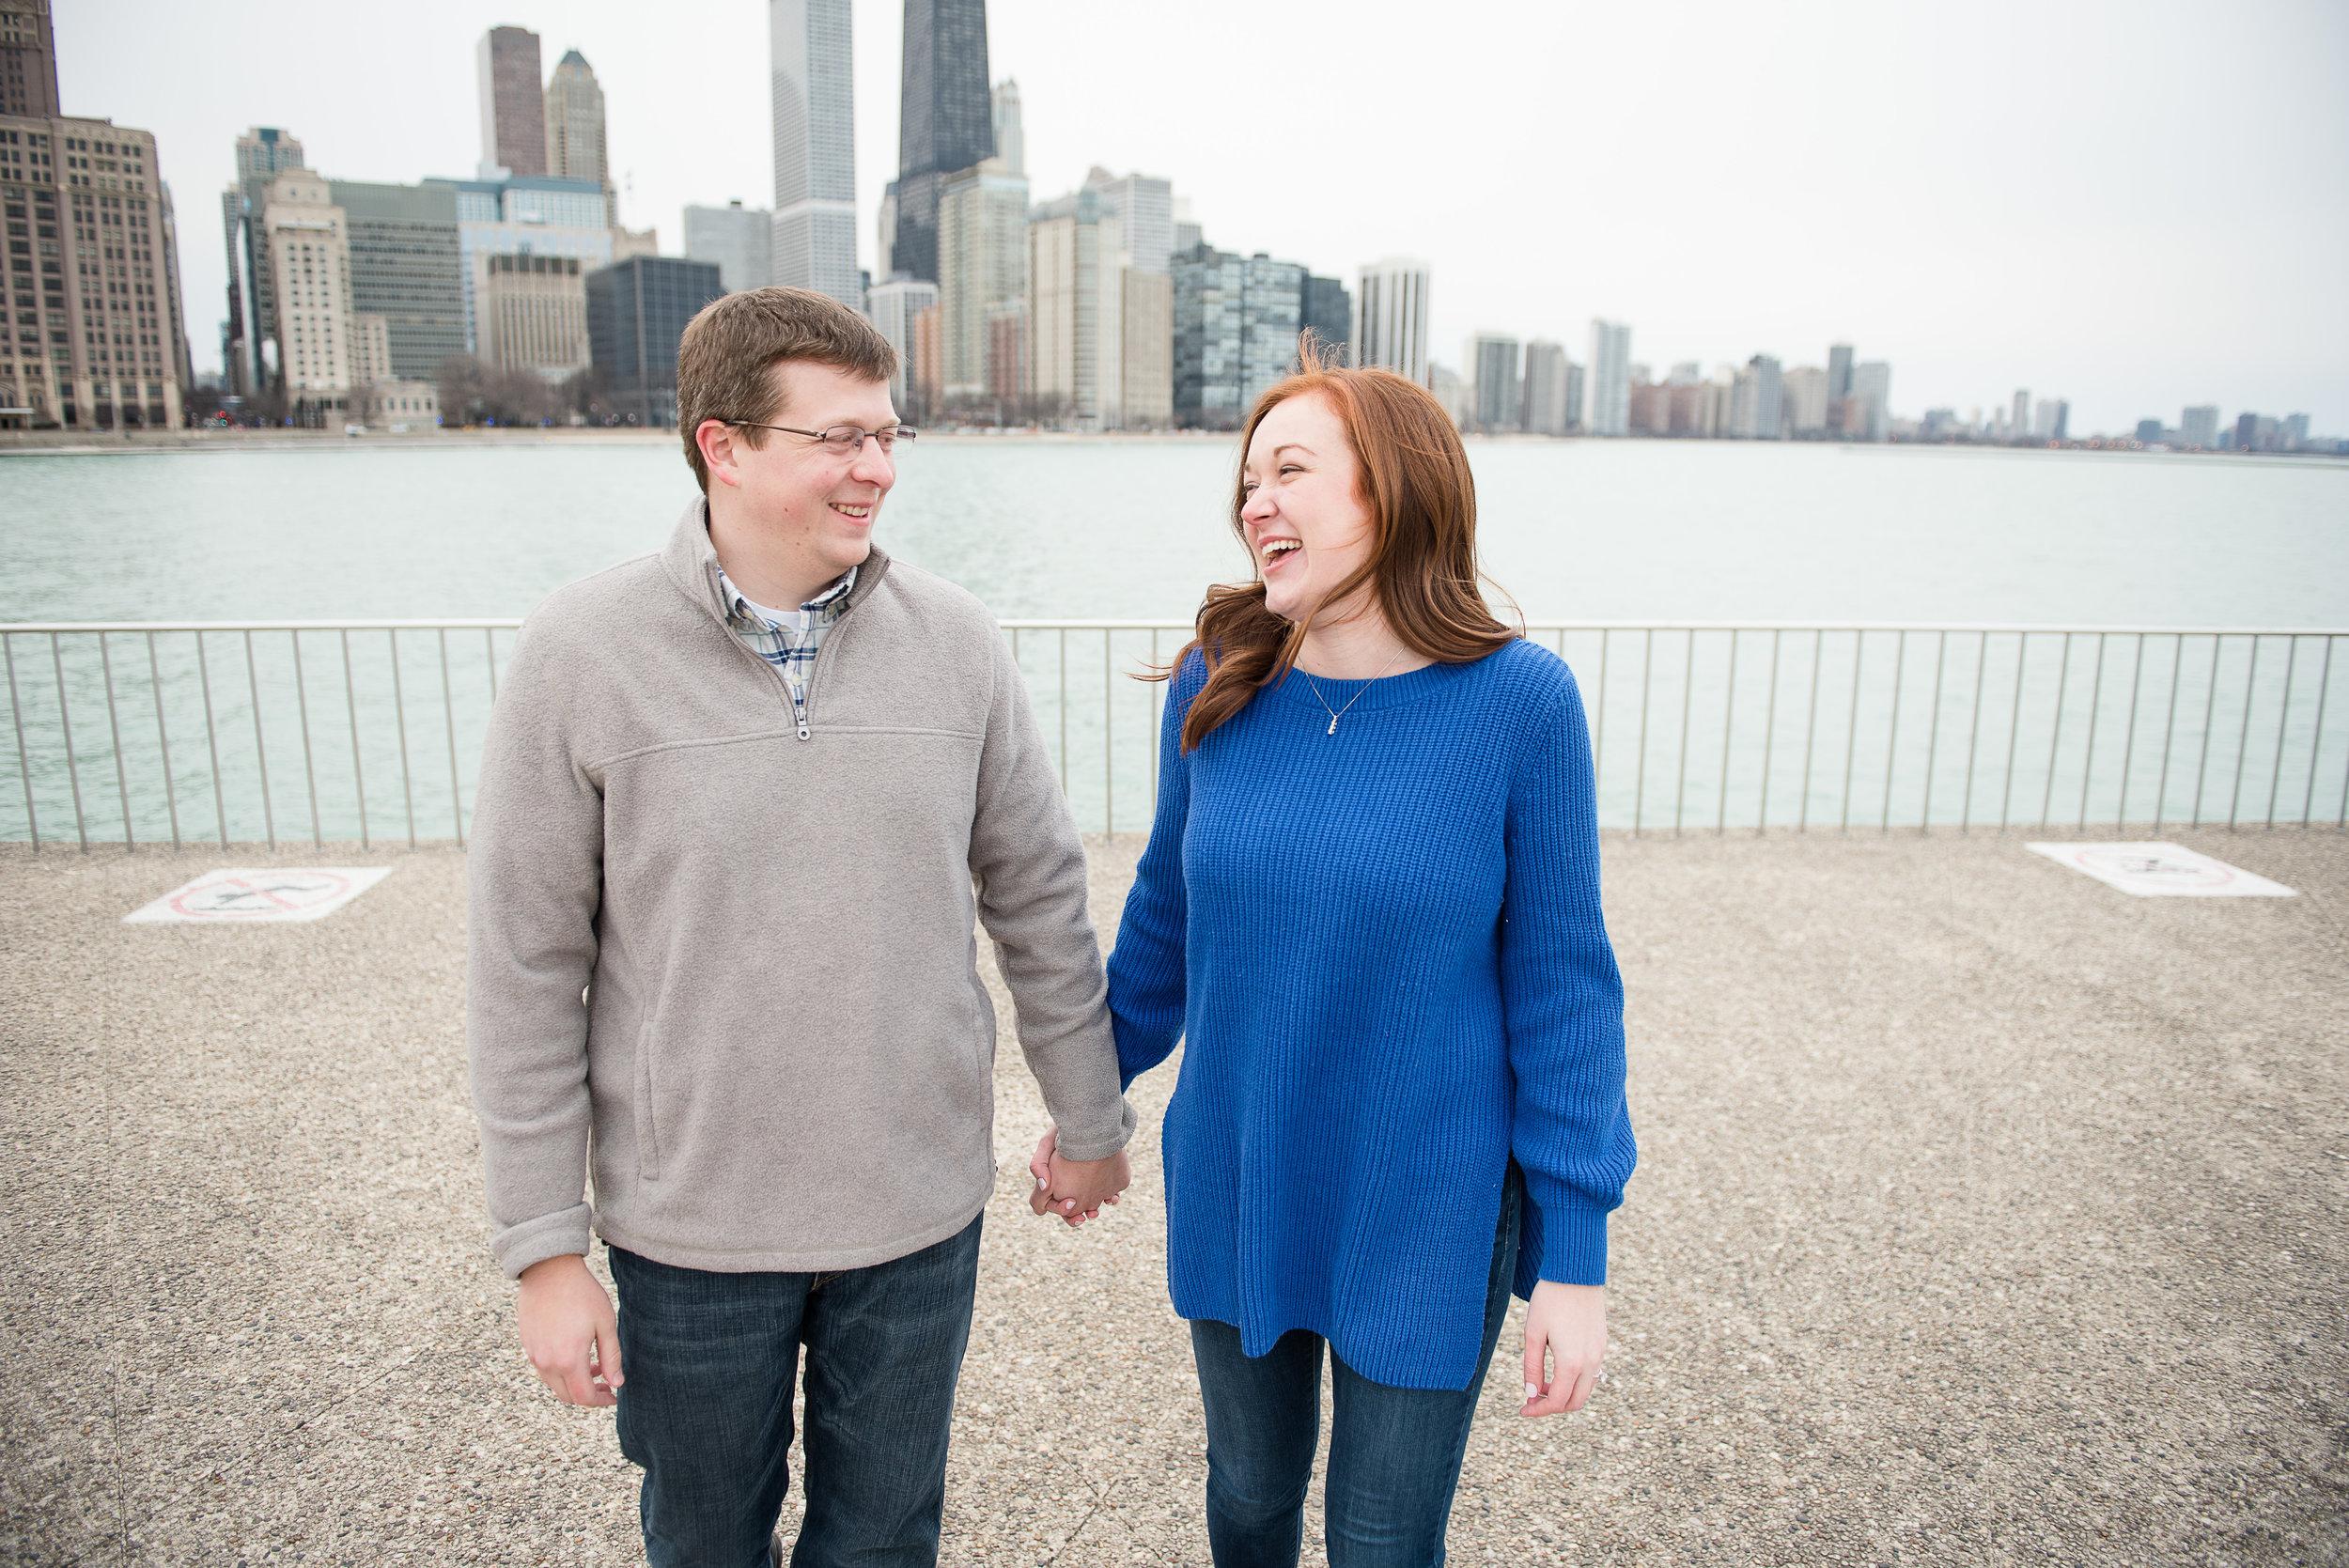 chicago-engagement-photography-metts-photo-8.jpg